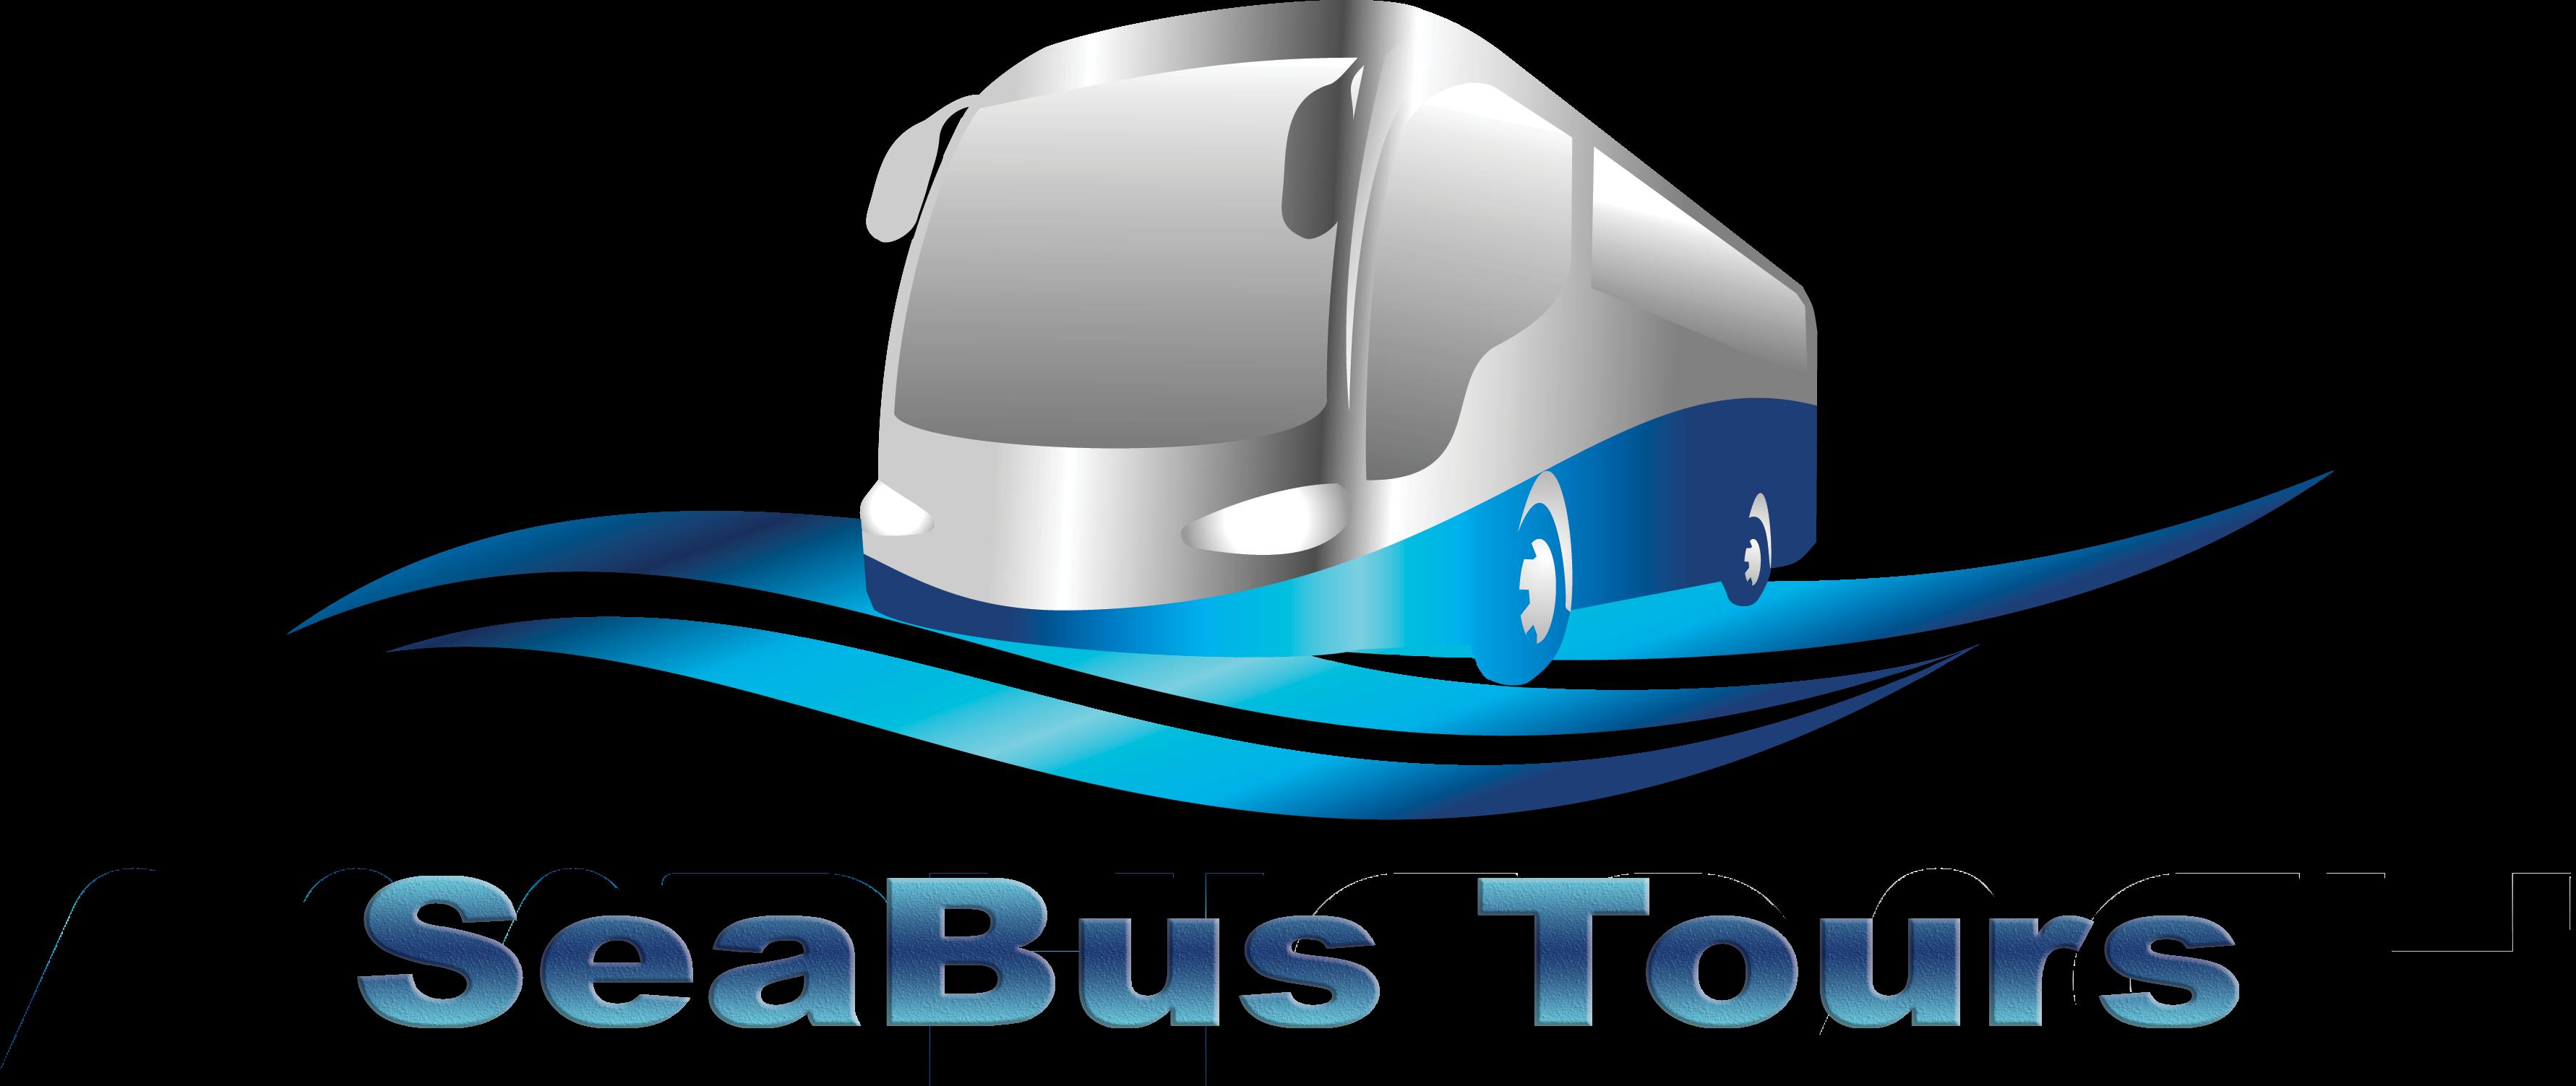 SeaBus Tours